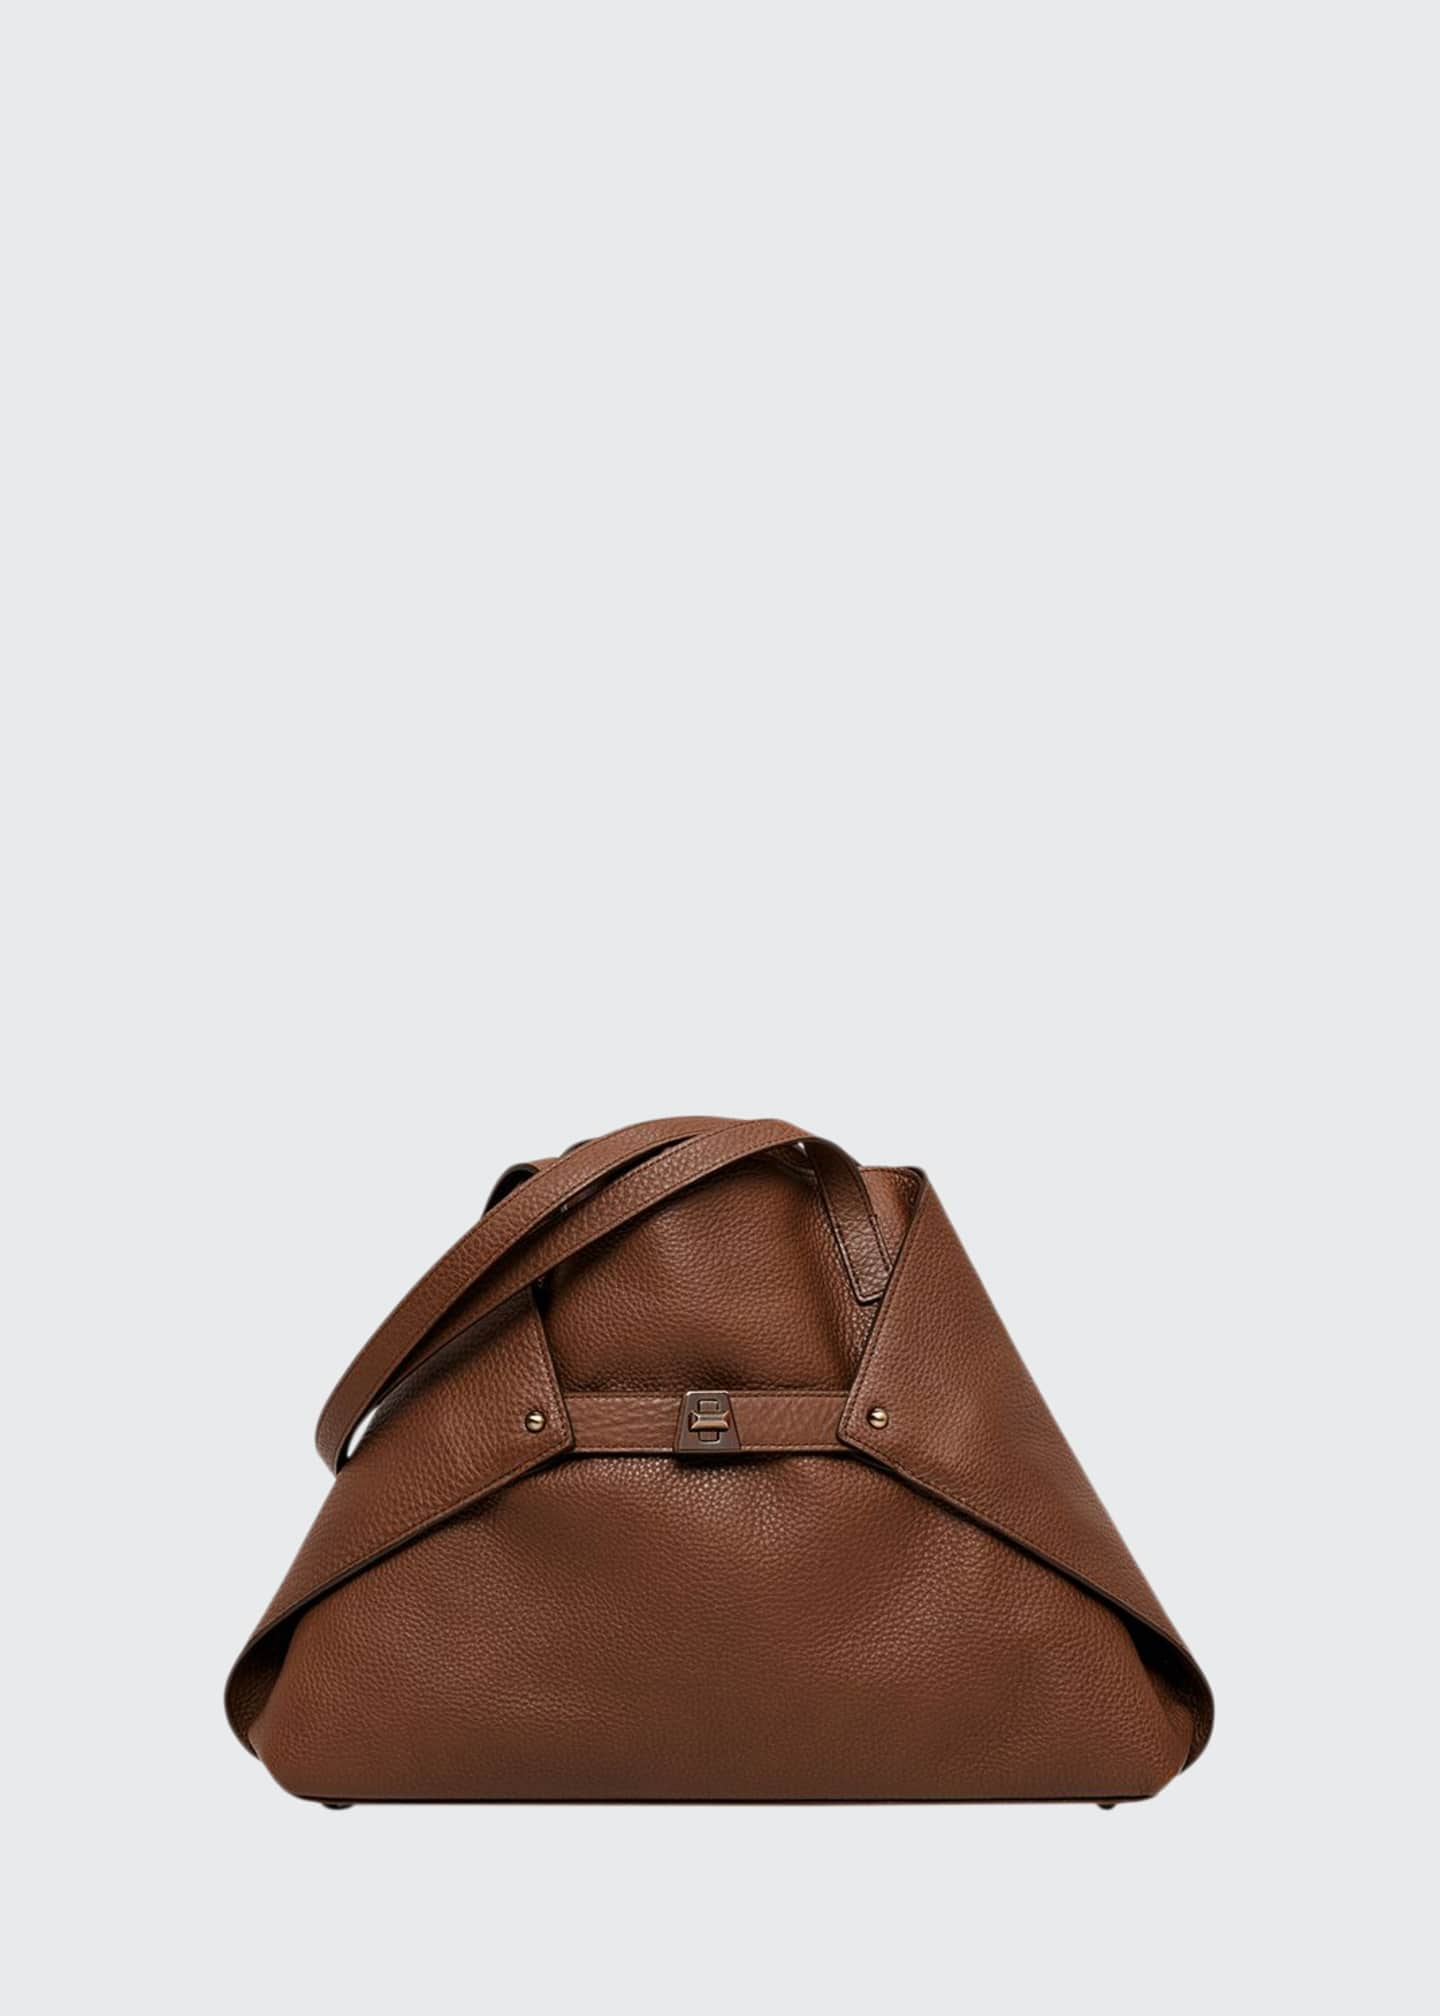 Akris Ai Small Leather Shoulder Tote Bag, Caramel